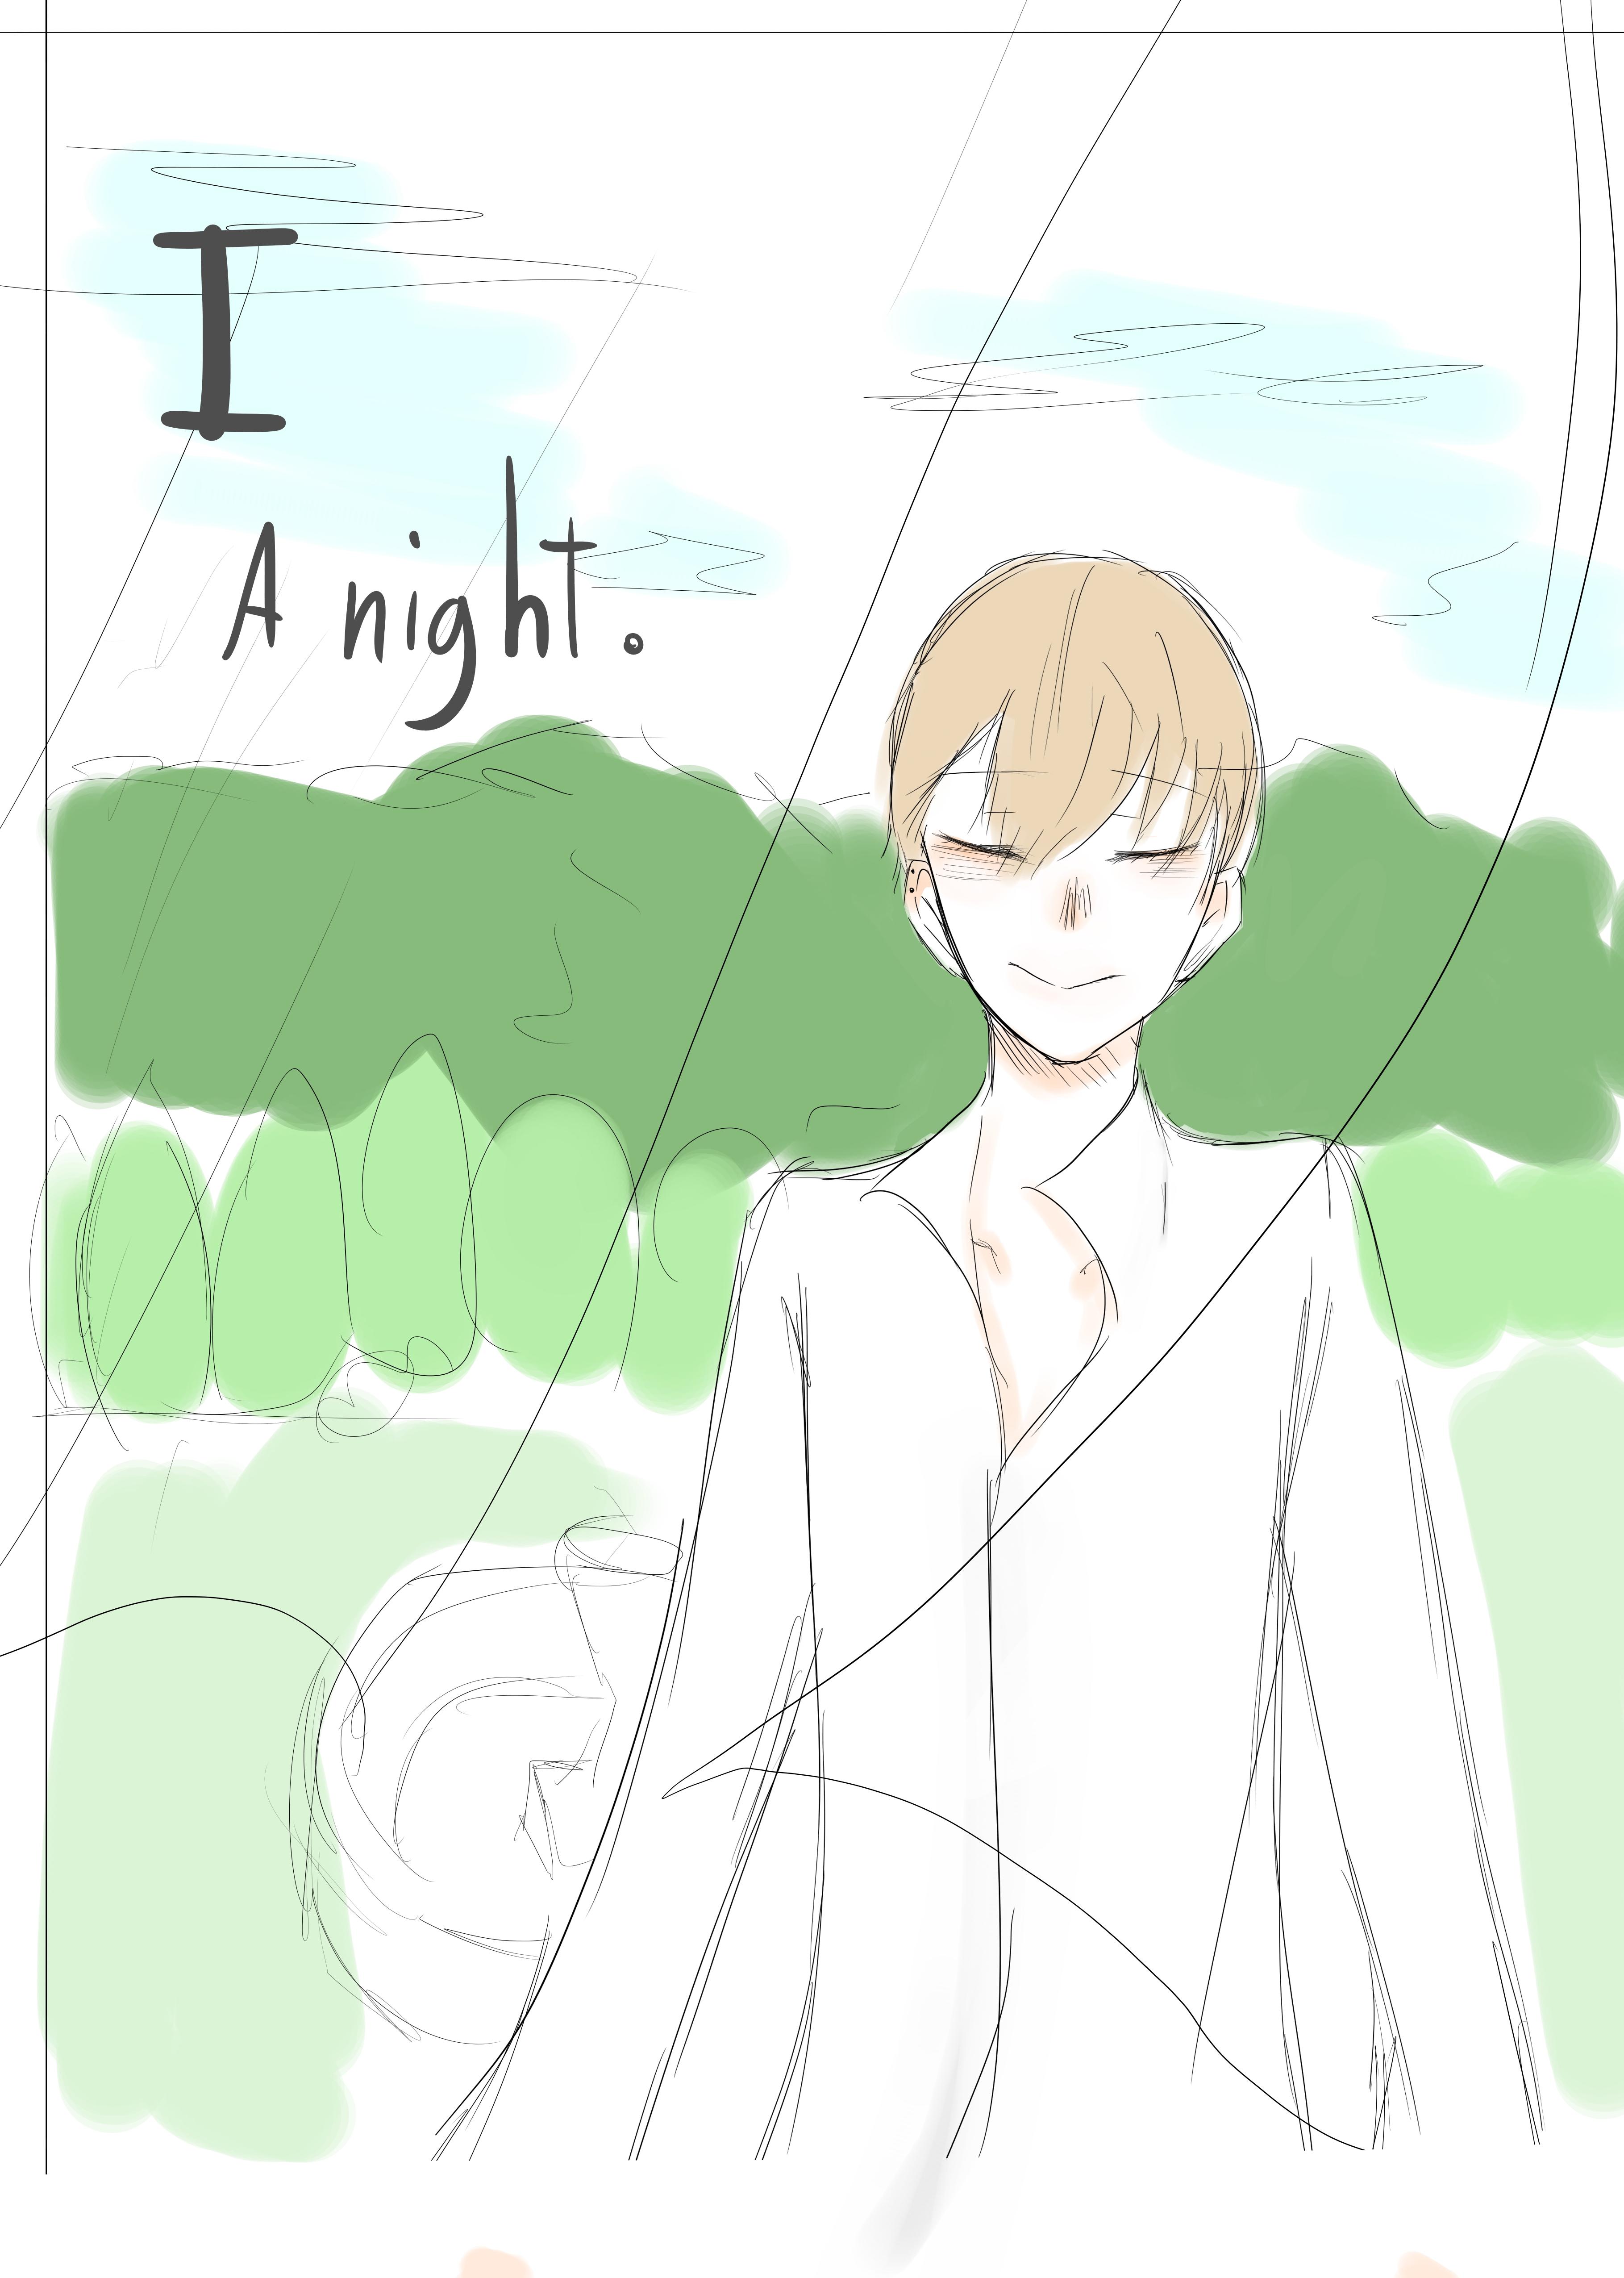 I - A night